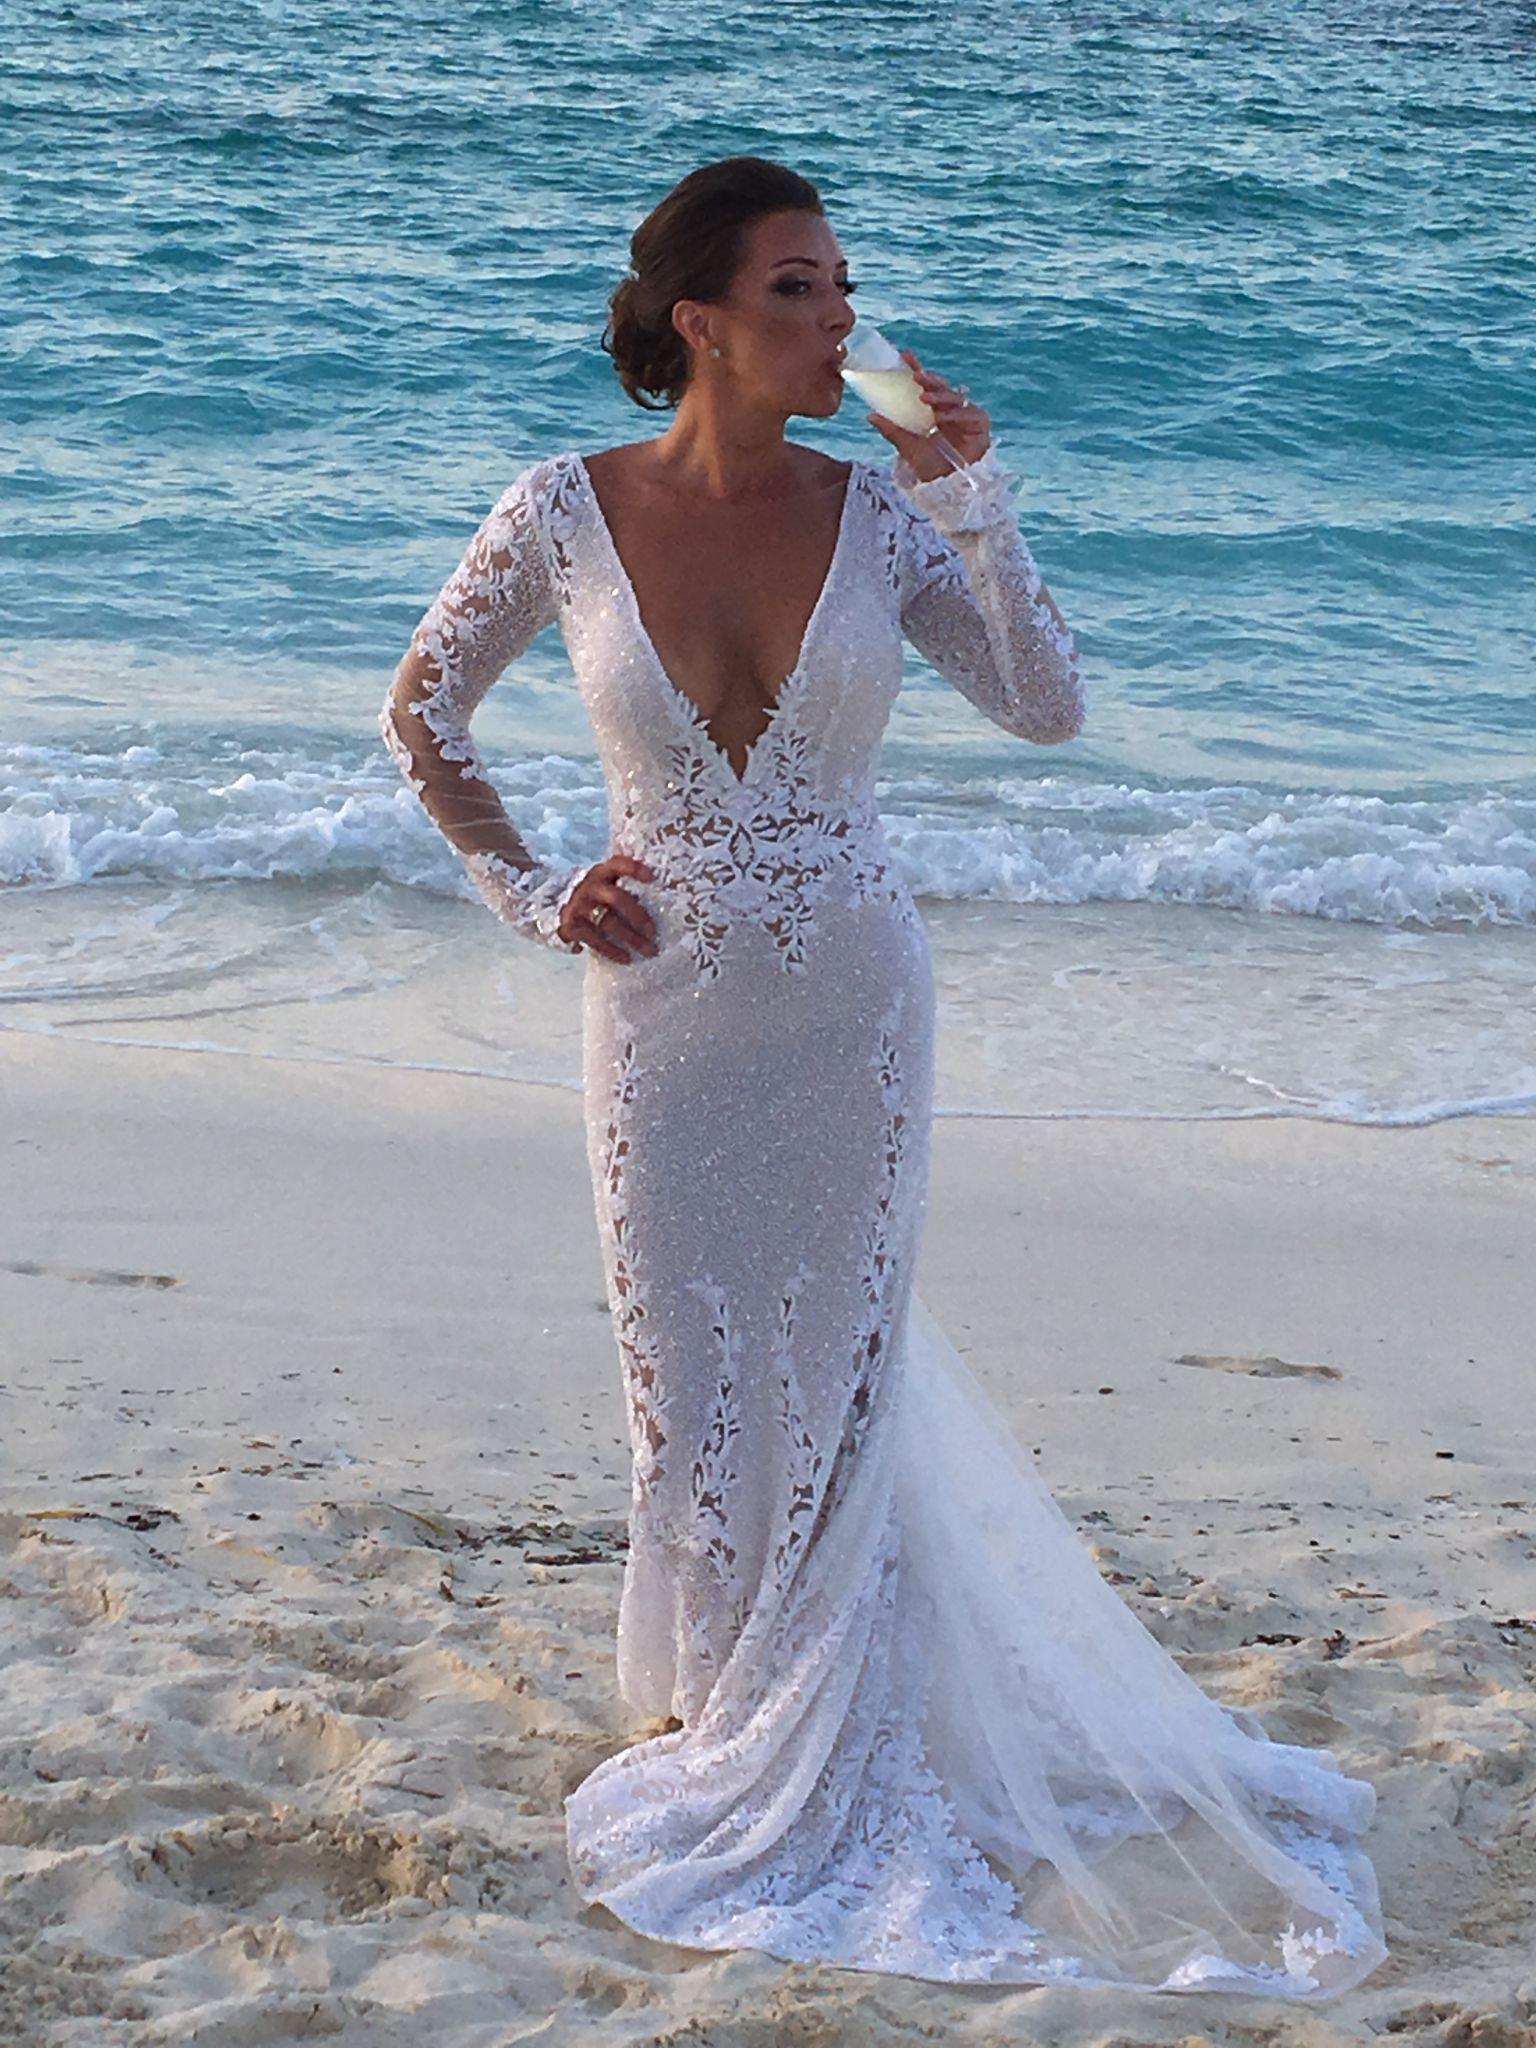 f74e2fd7729f Berta 17 - 135 , $7,500 Size: 8 | Used Wedding Dresses in 2019 ...